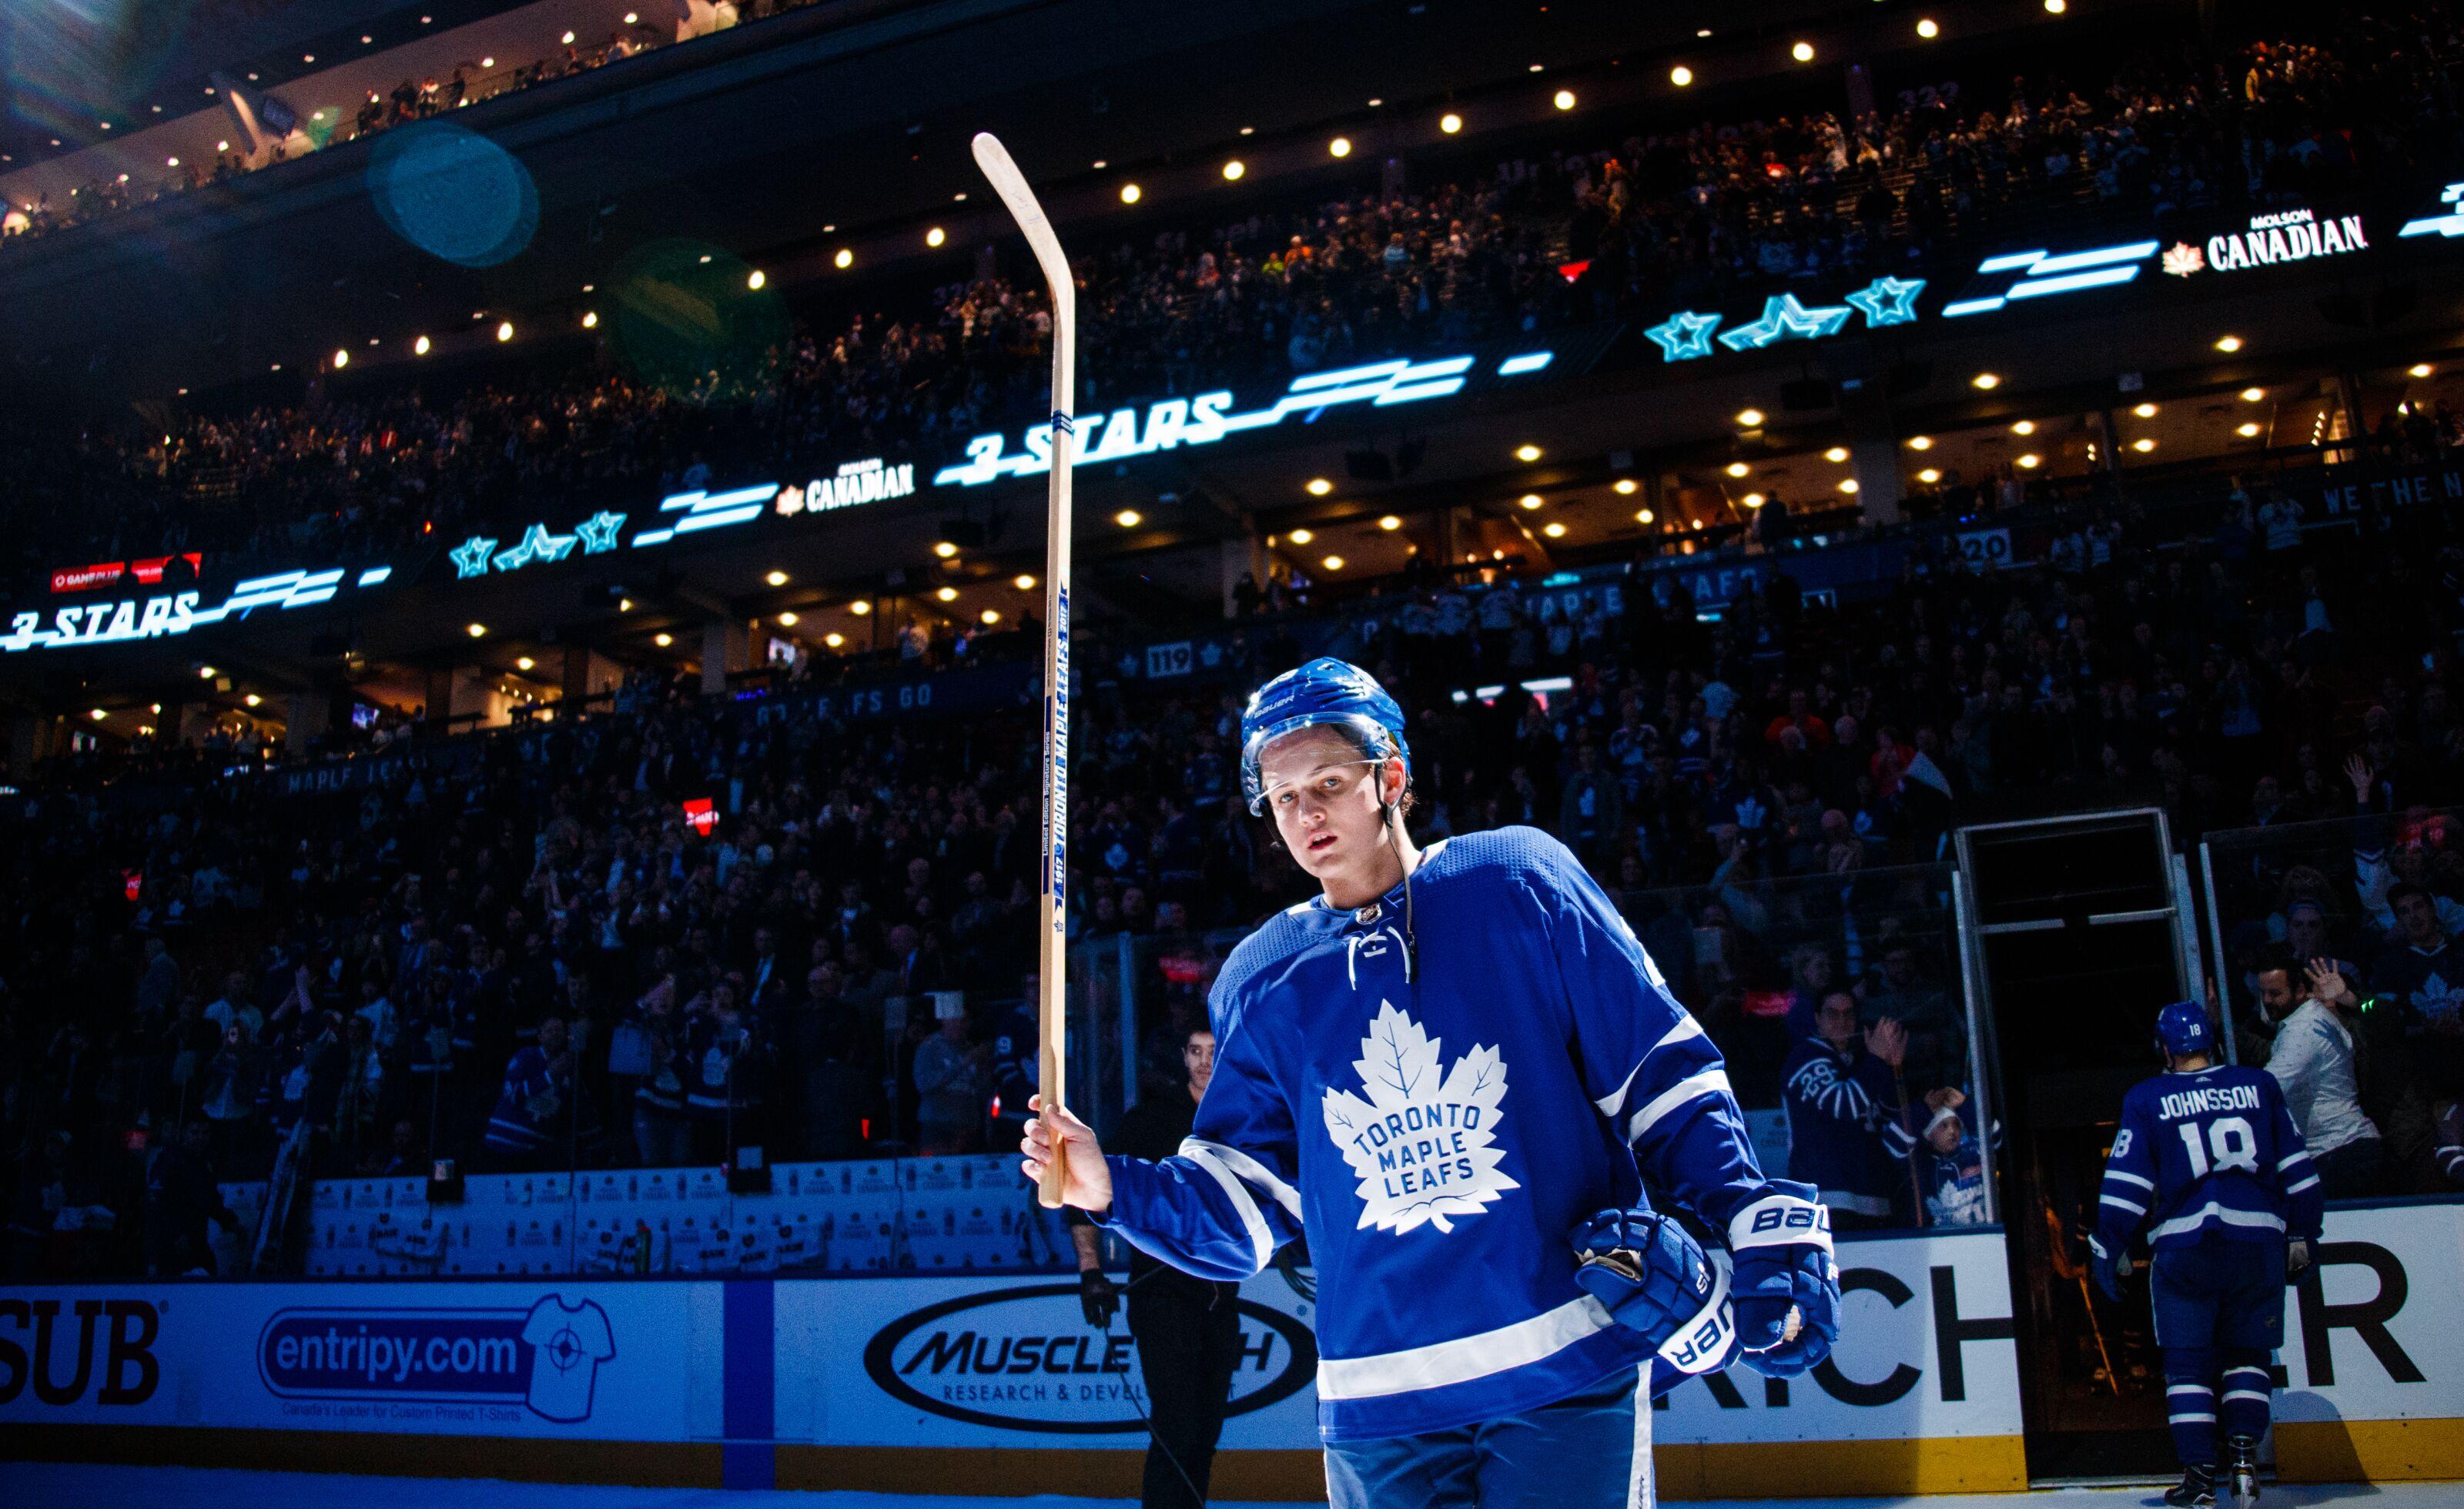 Toronto Maple Leafs  Don t Sign William Nylander to Bridge Deal 2e87e94c852